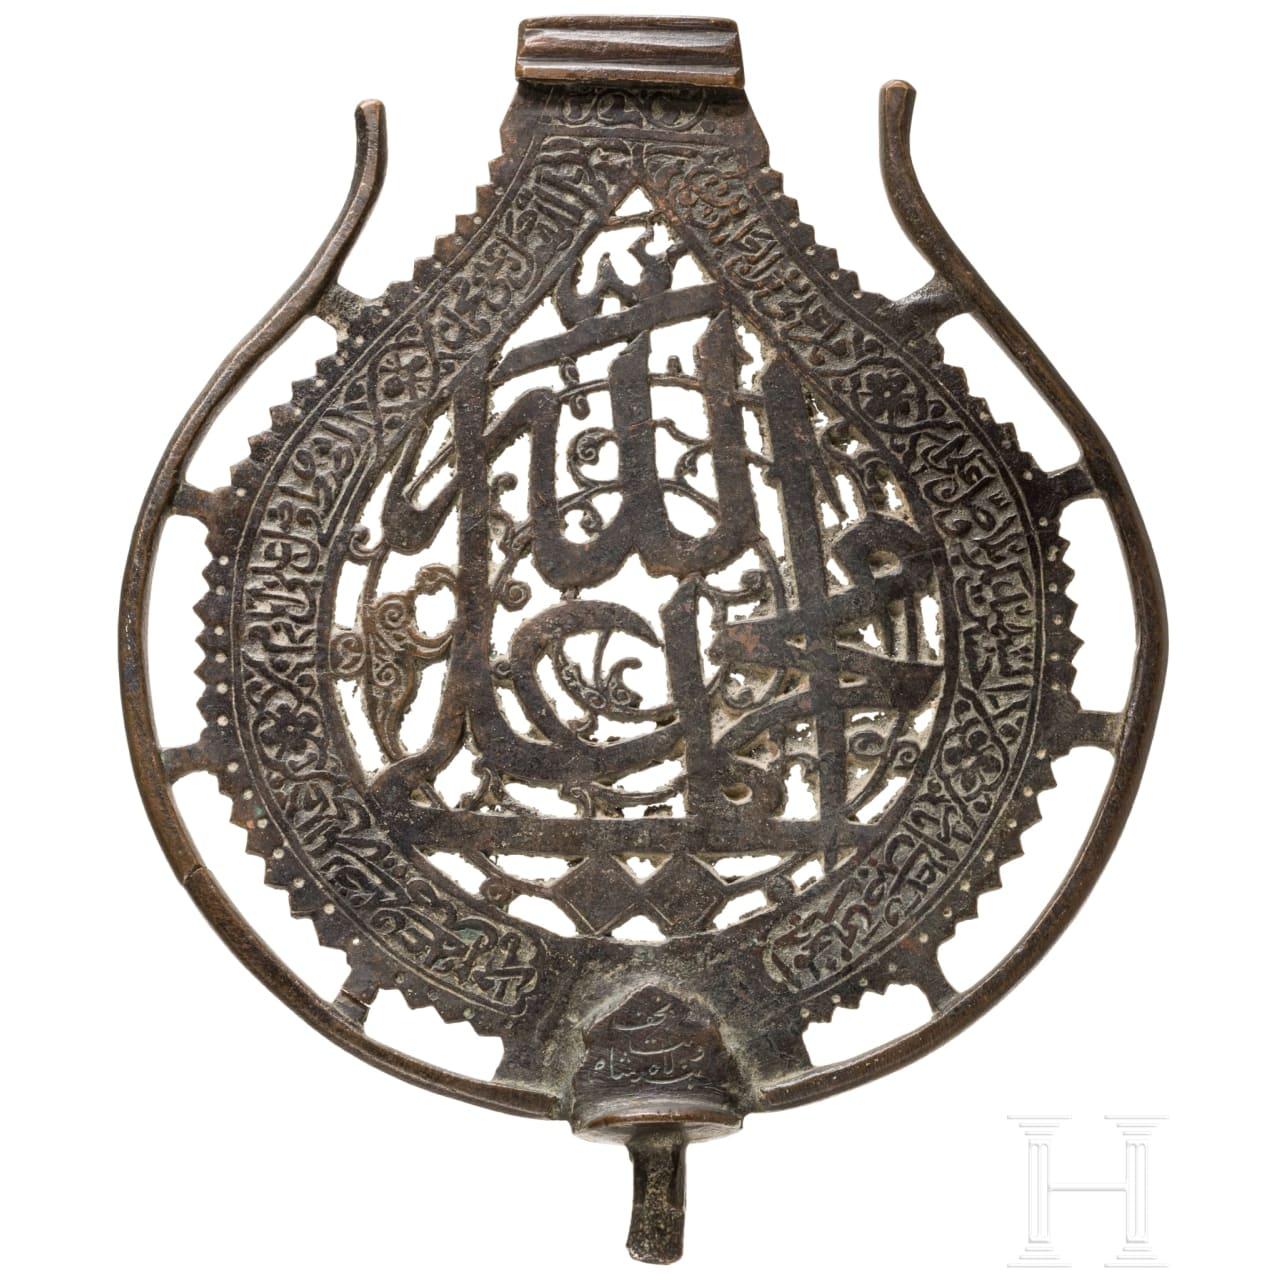 A Persian bronze standard, 16th/17th century